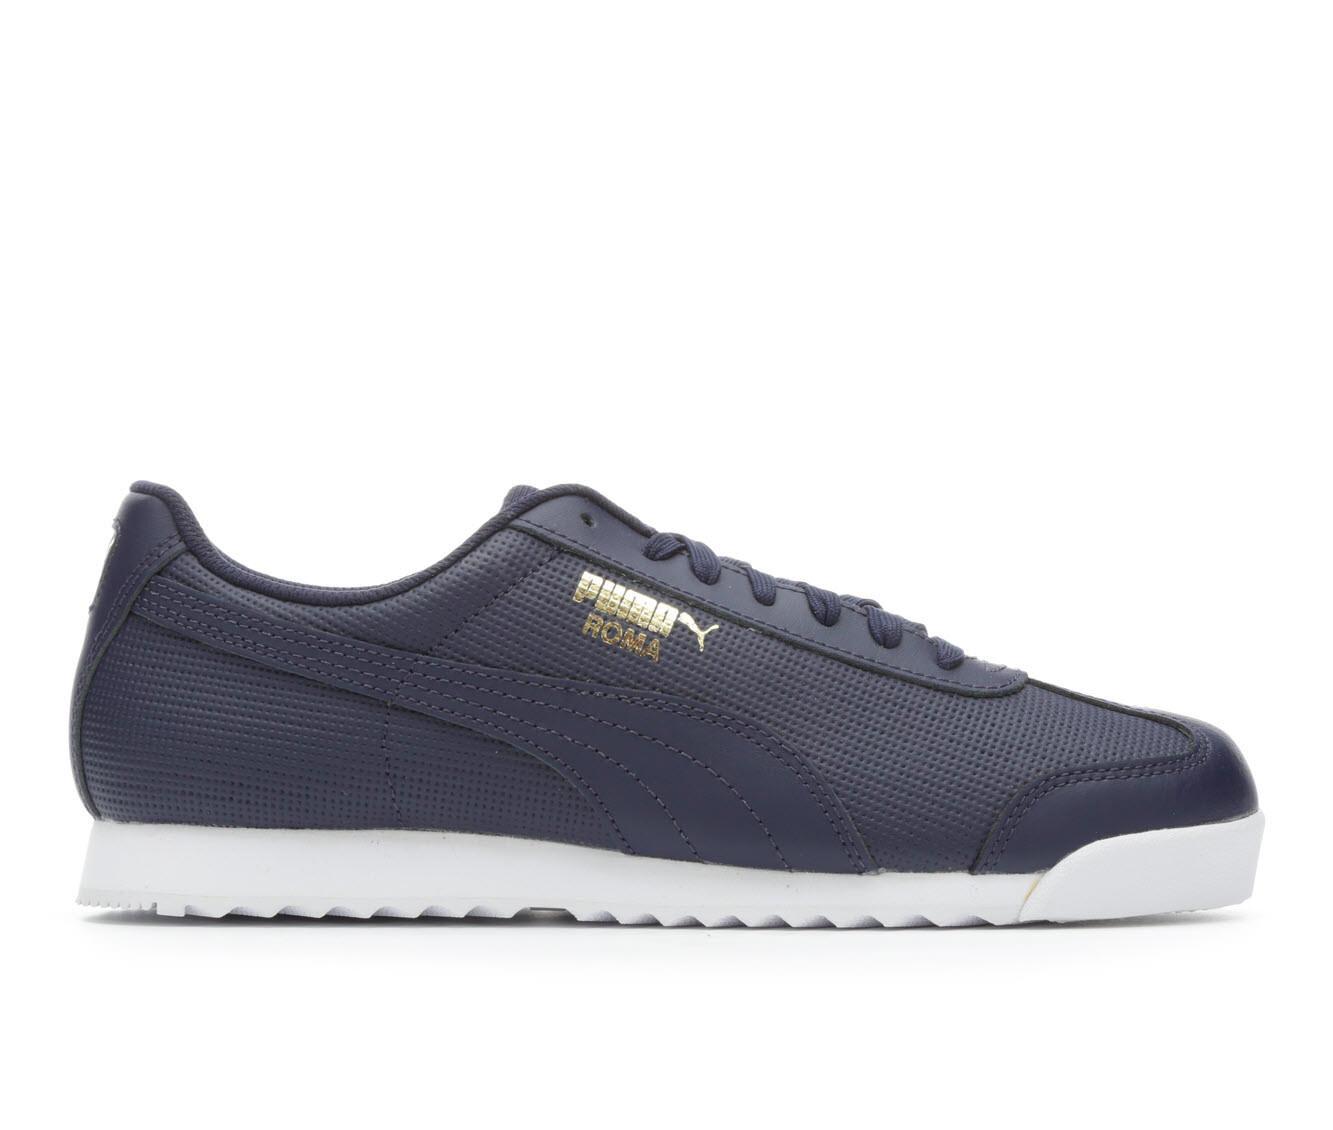 Men's Puma Roma Perf Sneakers sale wiki clearance deals outlet deals 9QBasEu